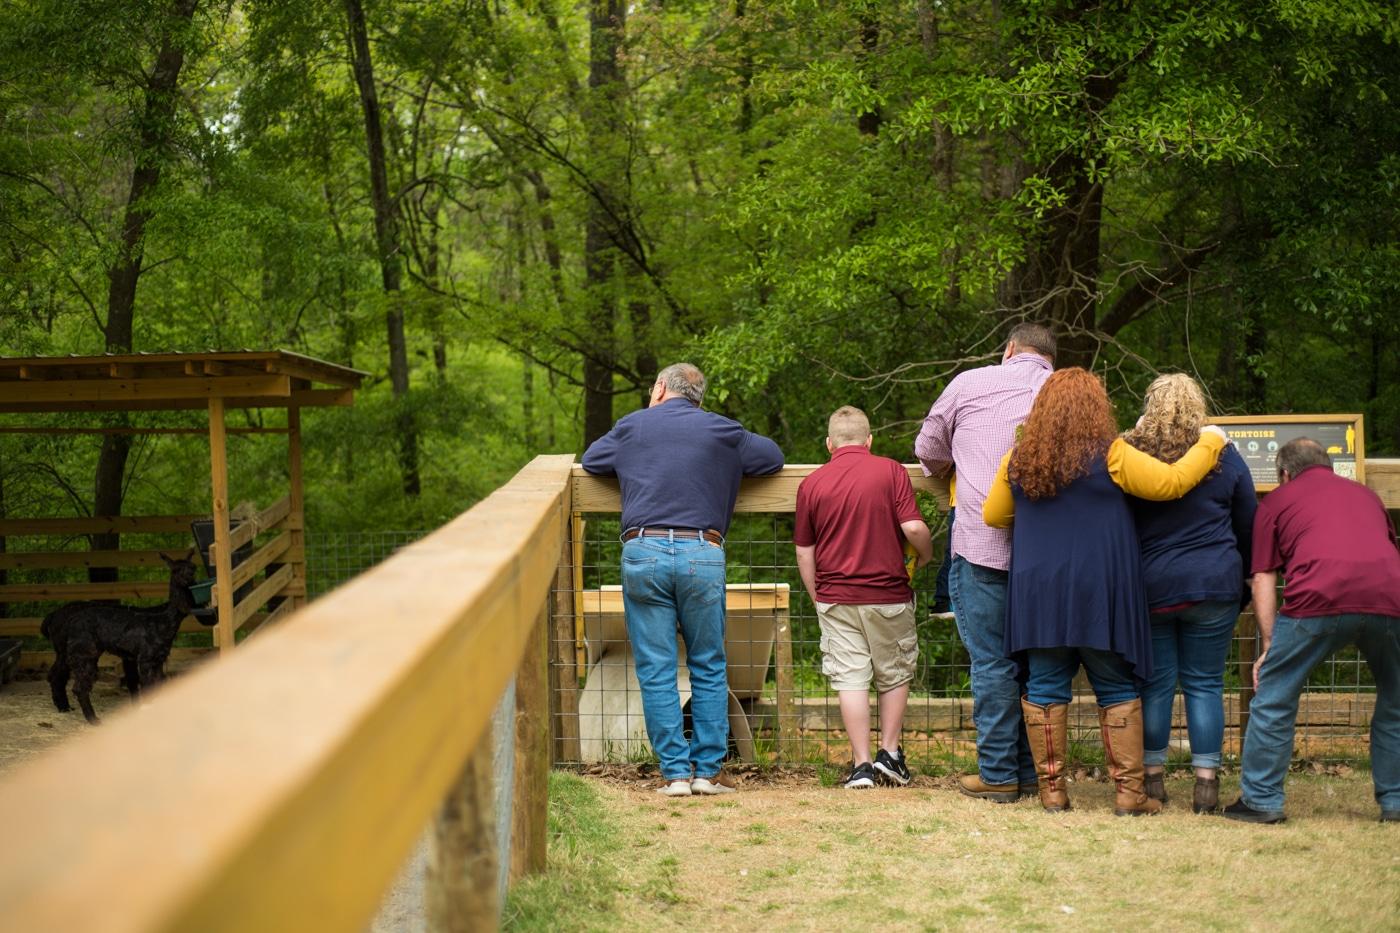 family looks at animals on wildlife preserve in Georgia